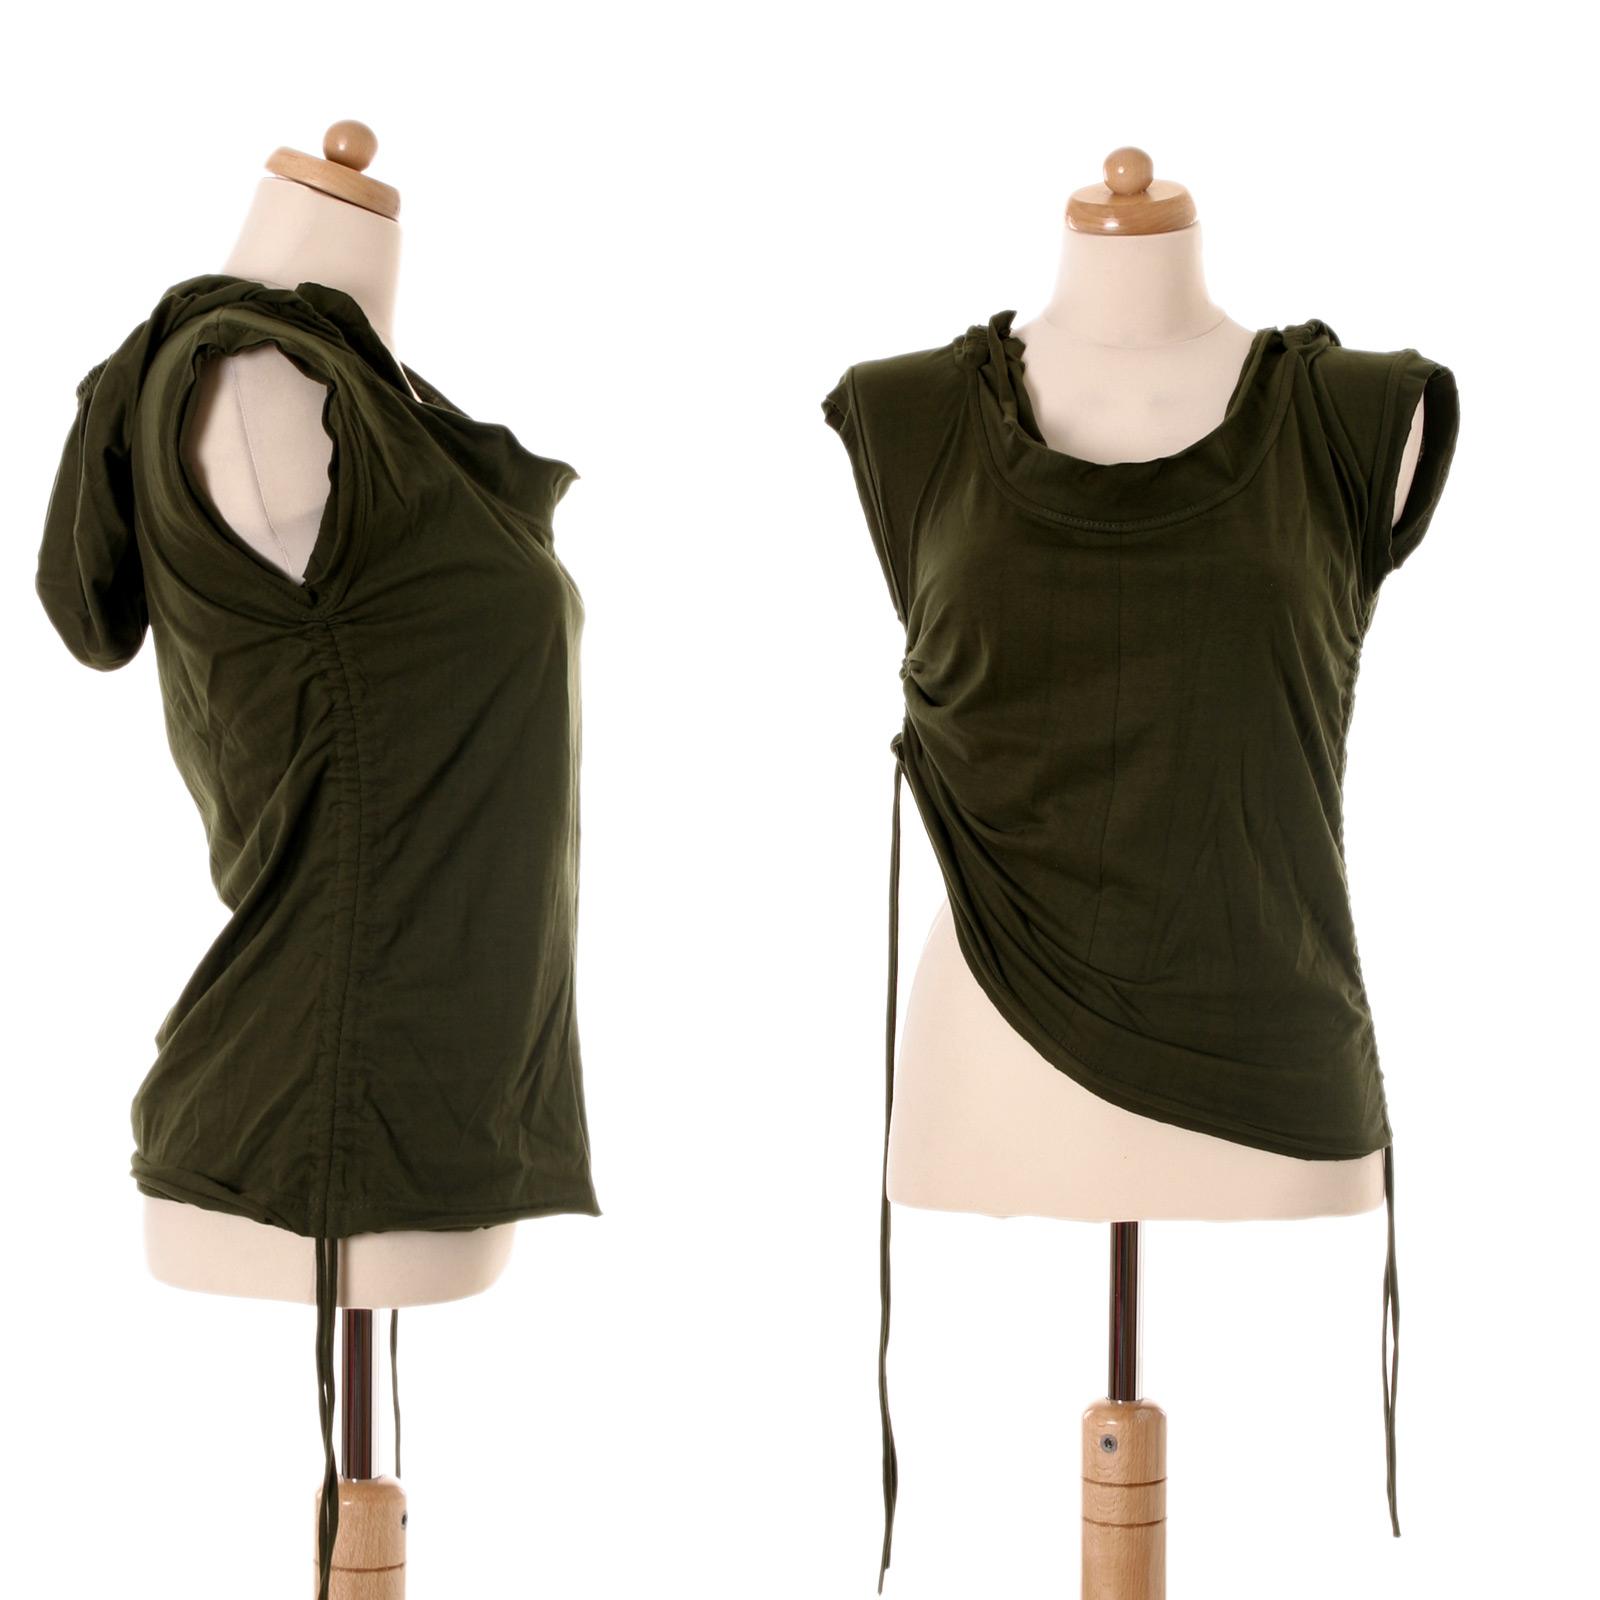 damen kapuzen kurzarm t shirt hoodie top kurz oberteil. Black Bedroom Furniture Sets. Home Design Ideas